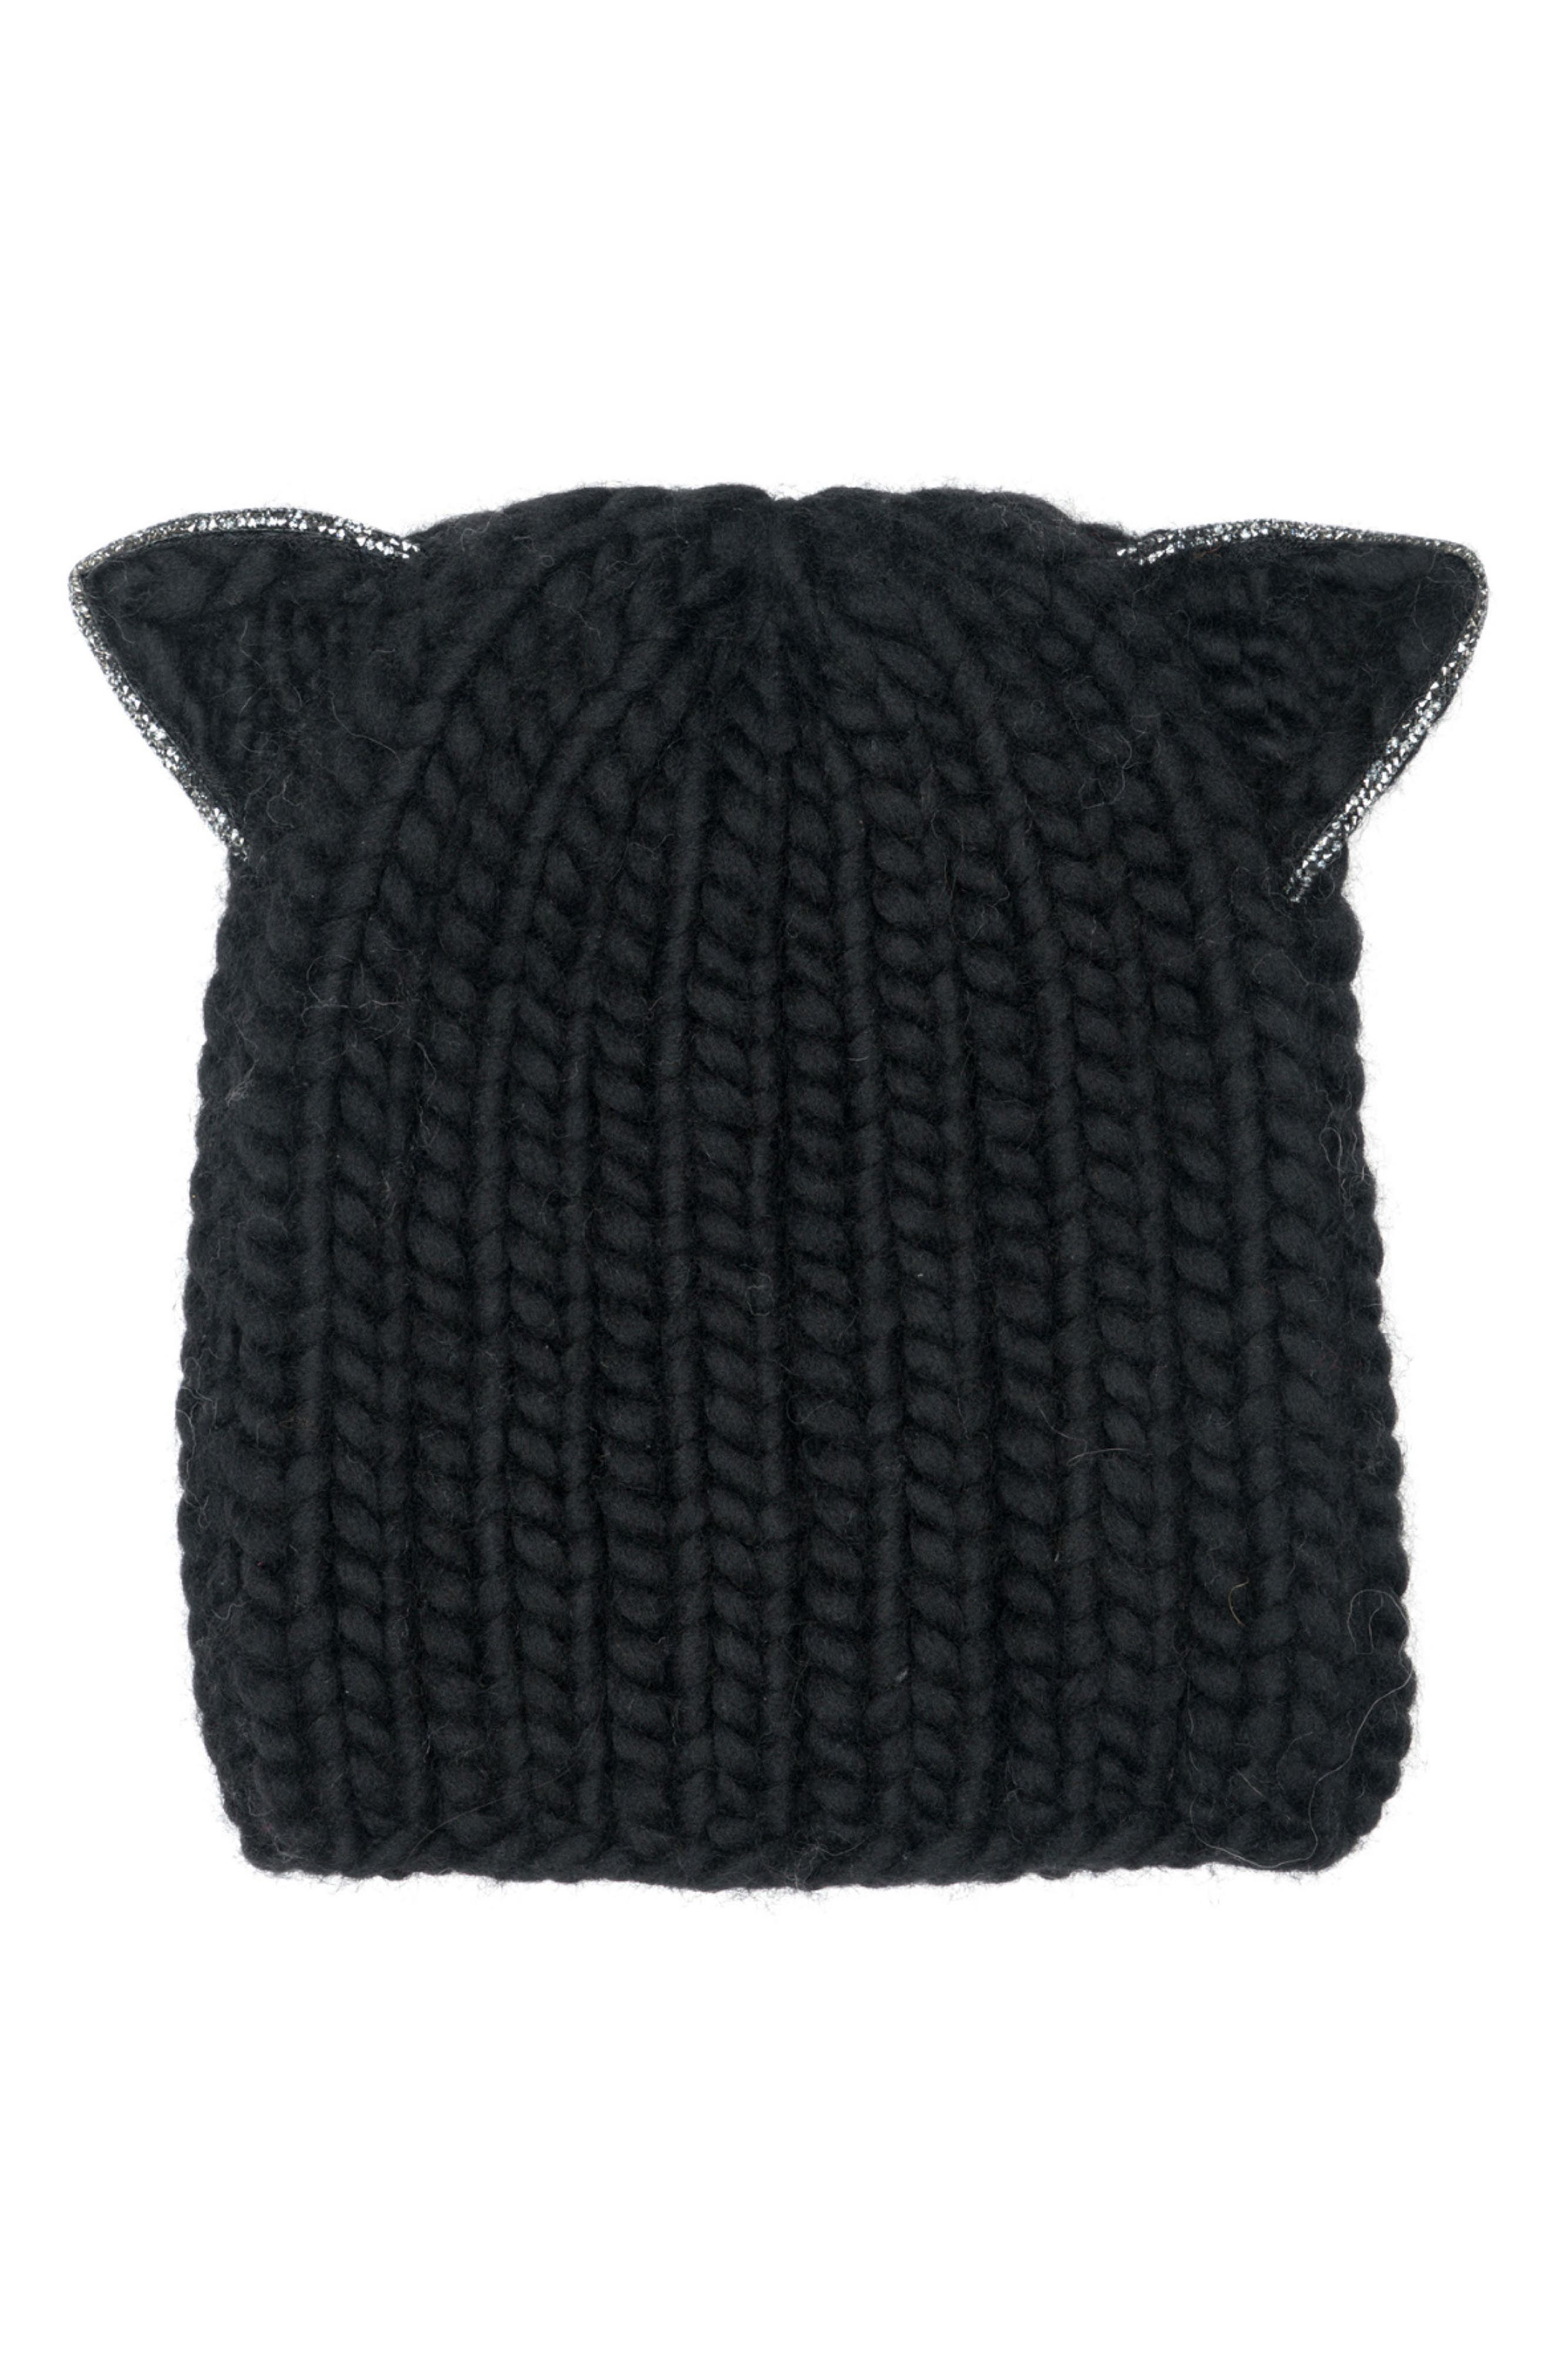 Felix Cat Ears Wool Knit Beanie,                         Main,                         color, Black